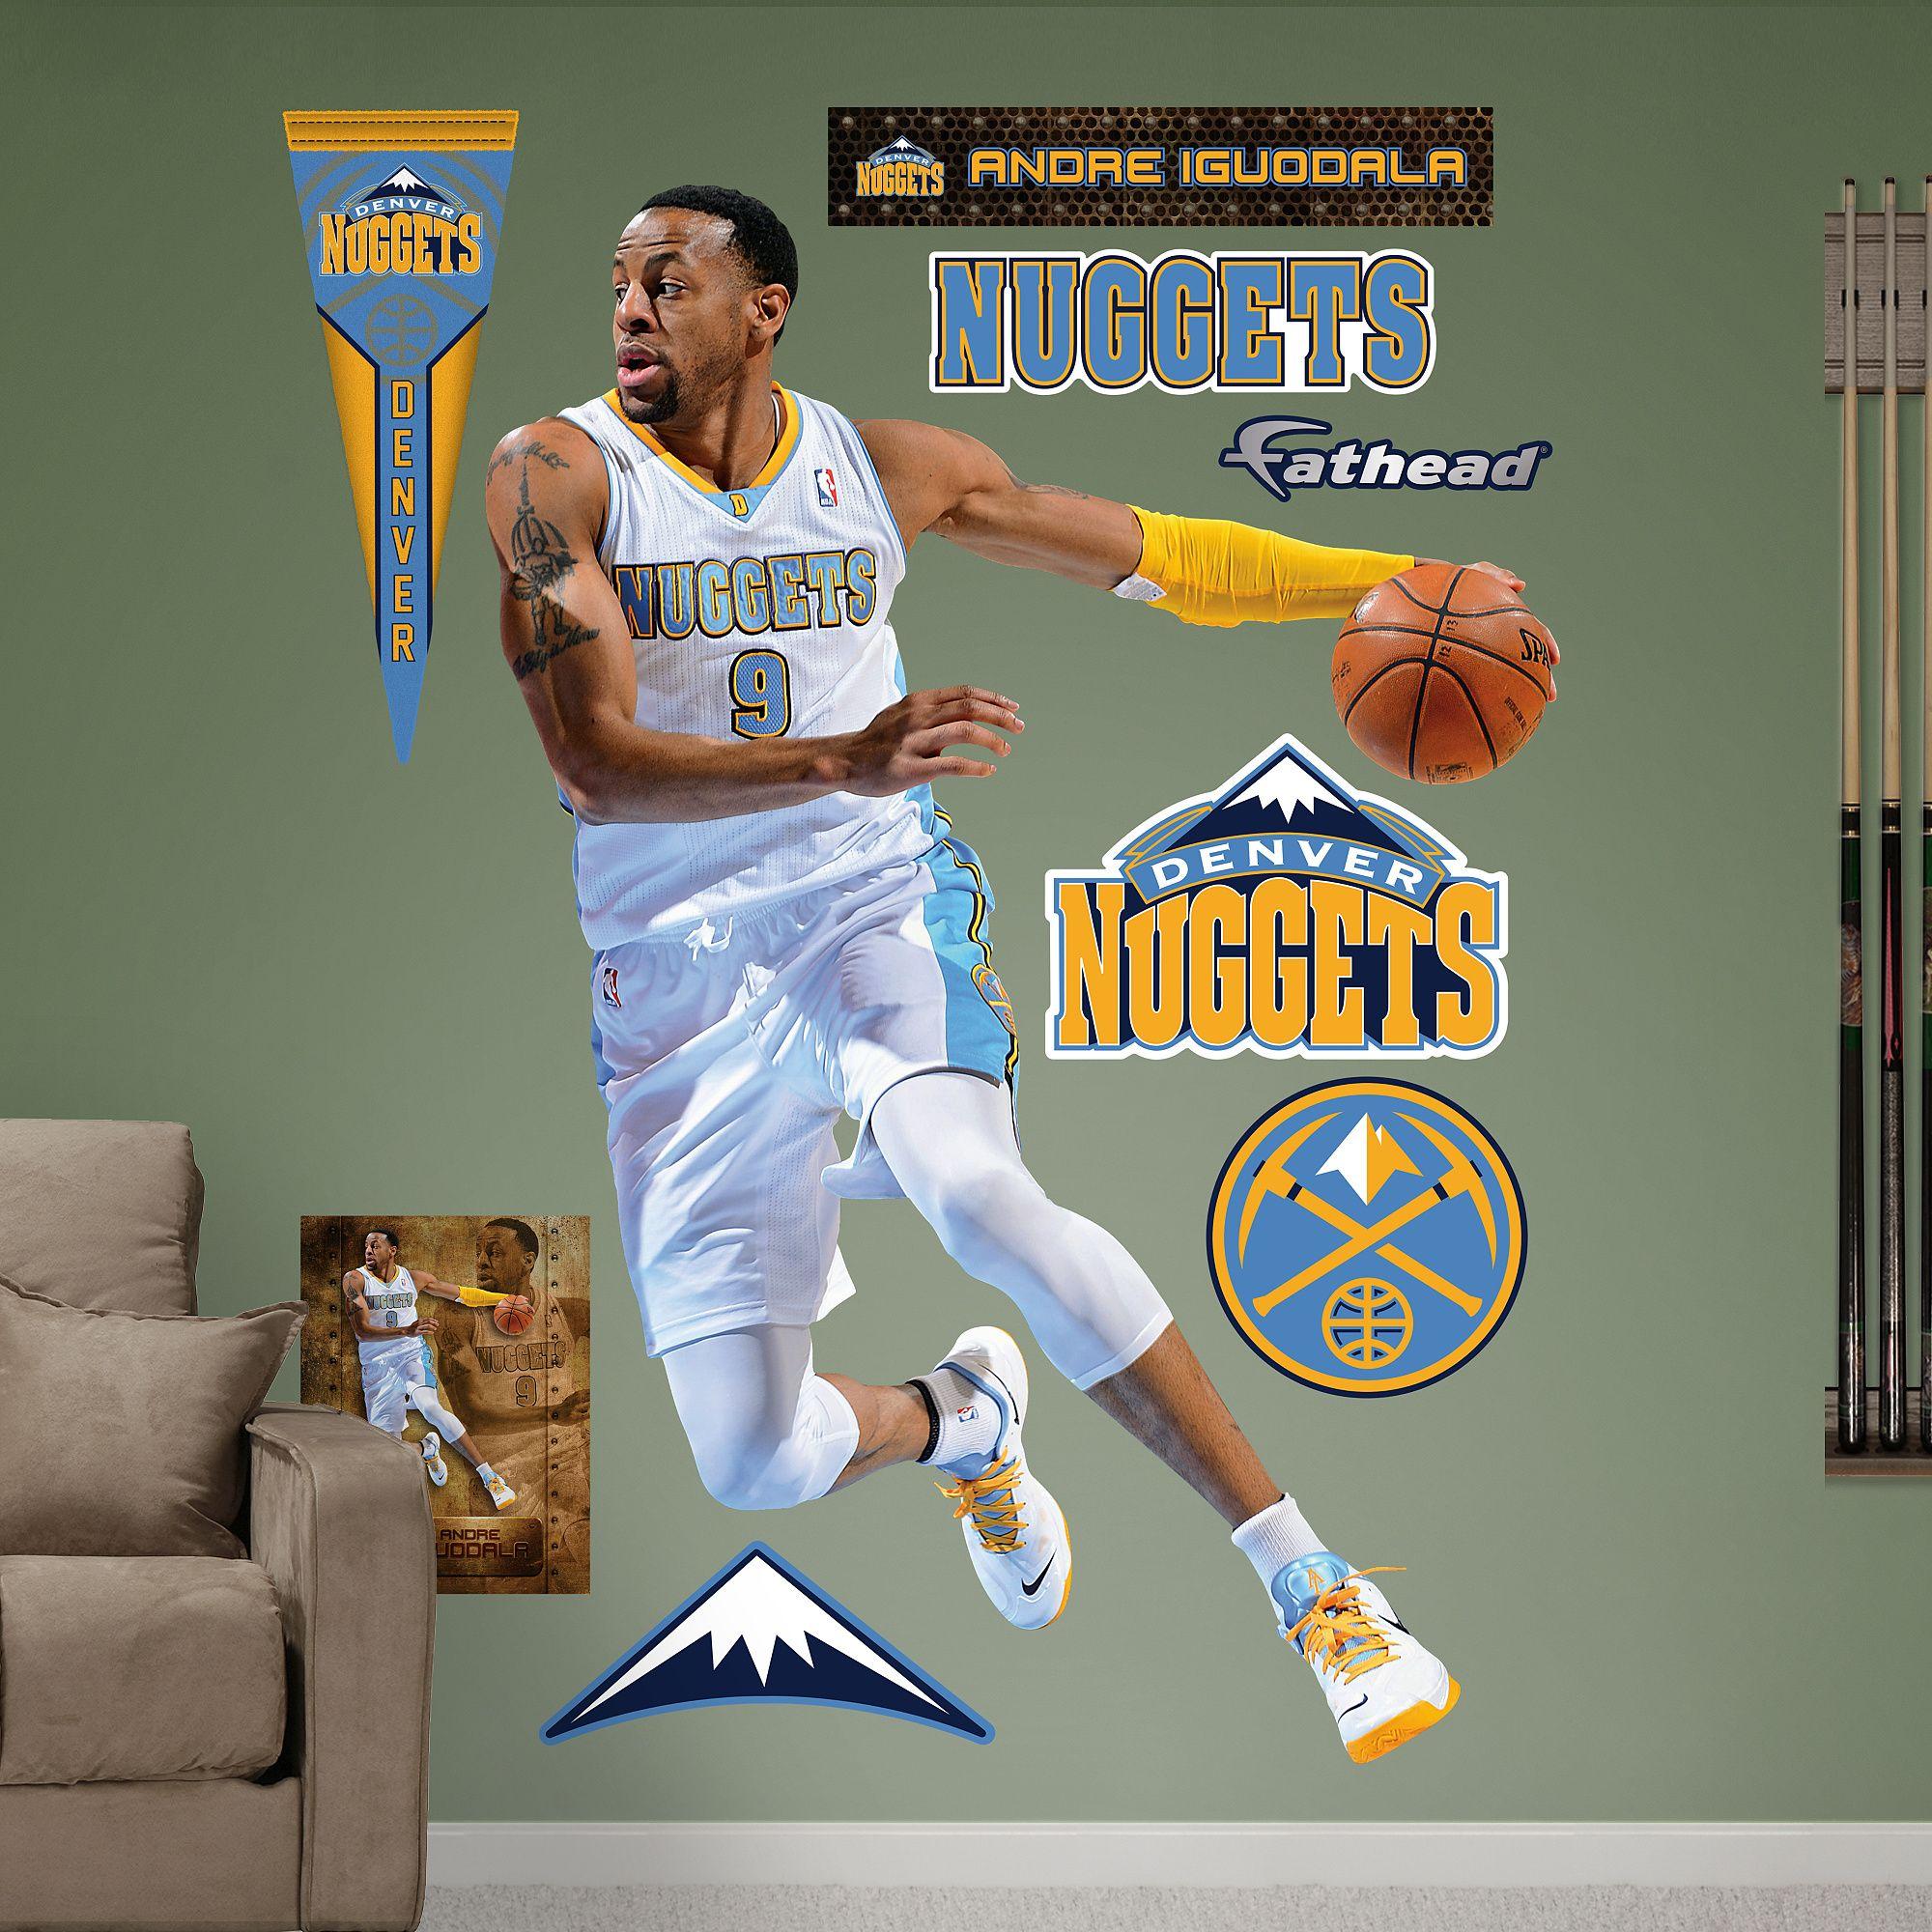 Denver Nuggets Famous Players: Andre Iguodala, Denver Nuggets